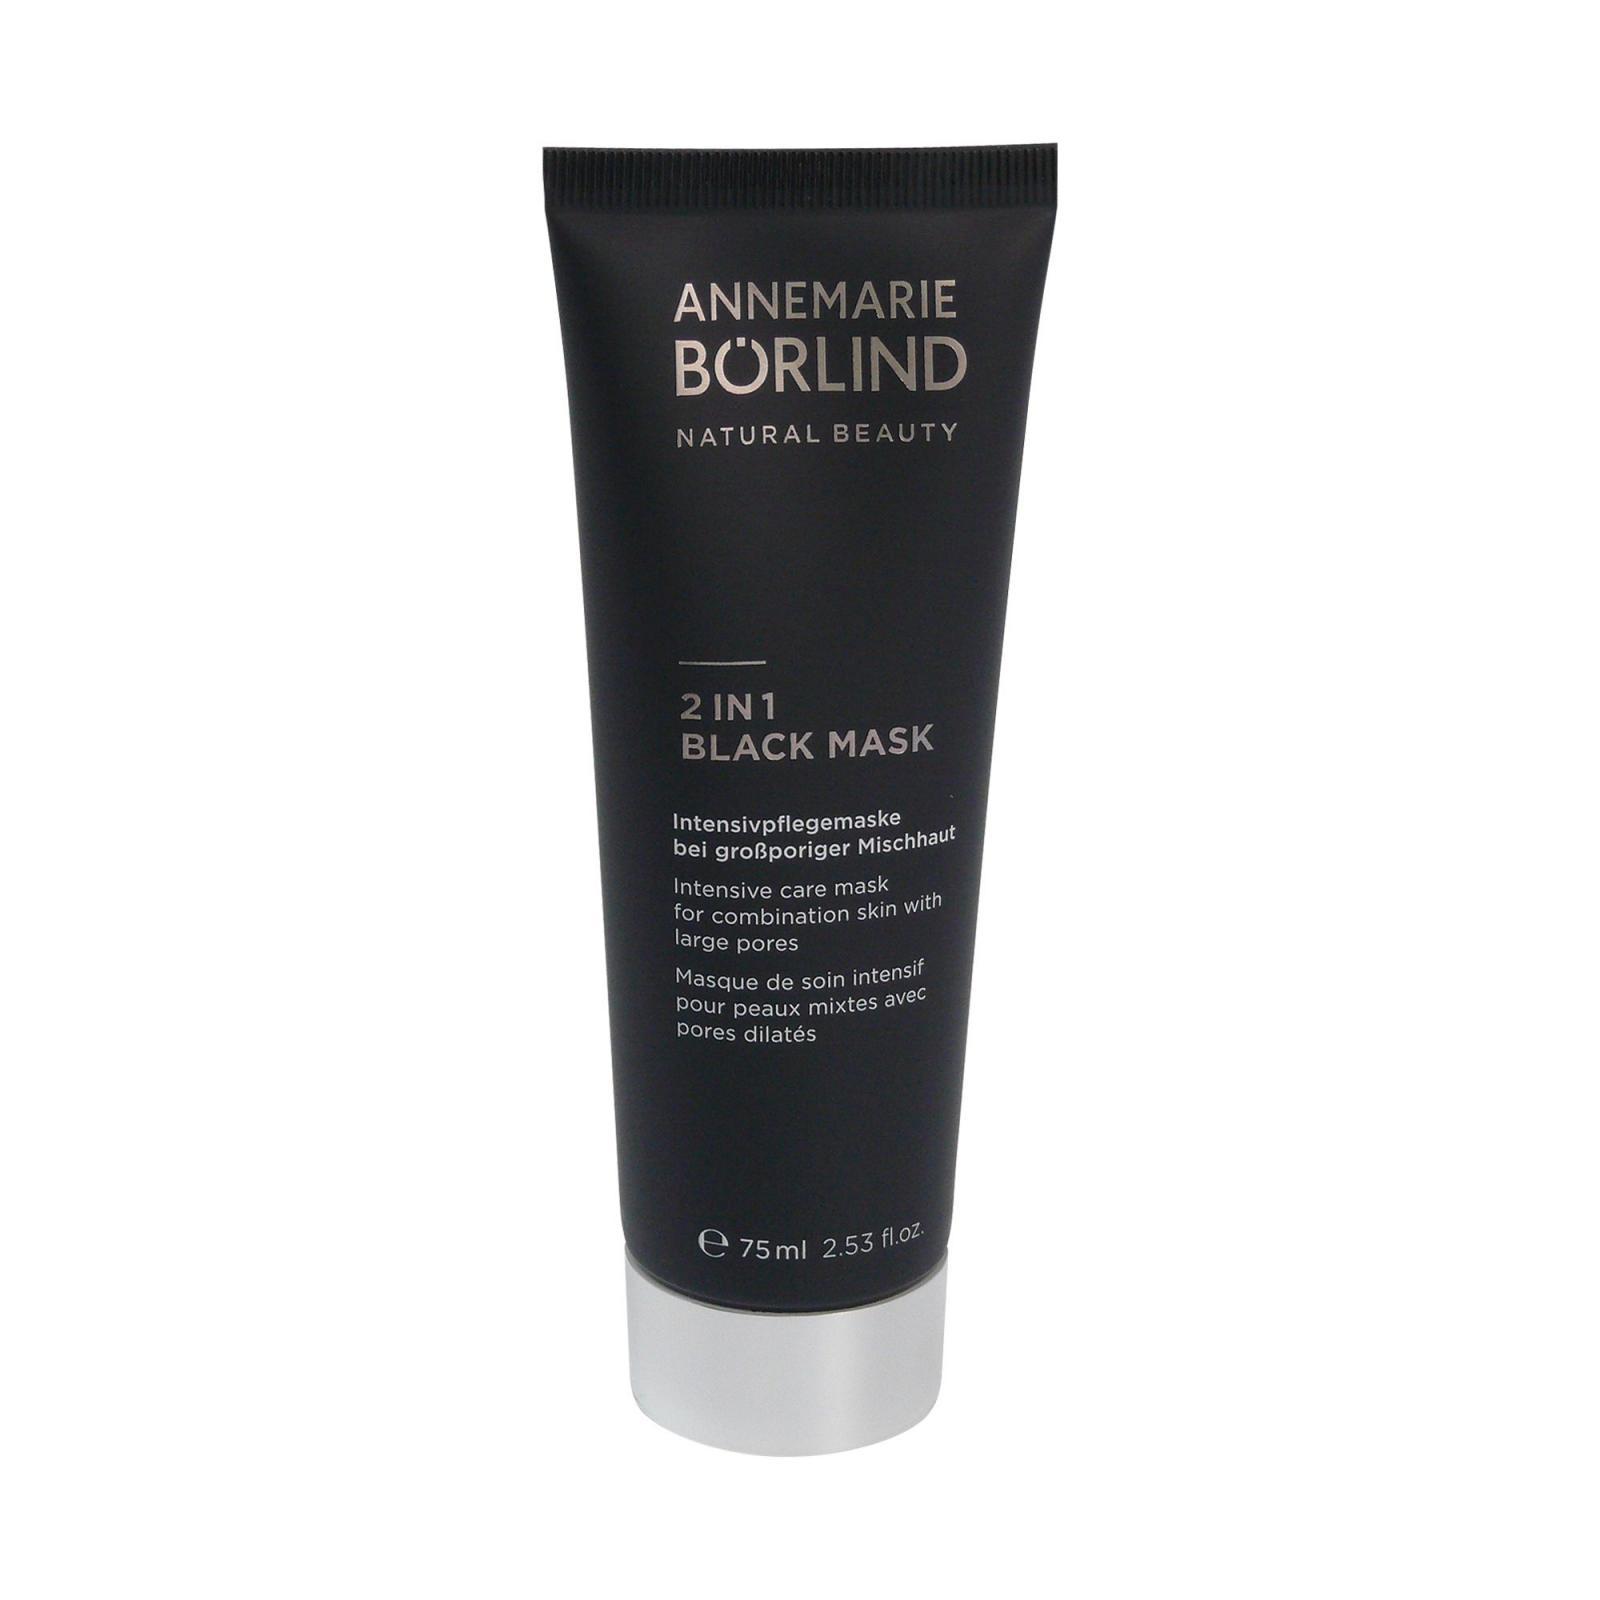 Annemarie Börlind Černá maska 2 v 1 75 ml